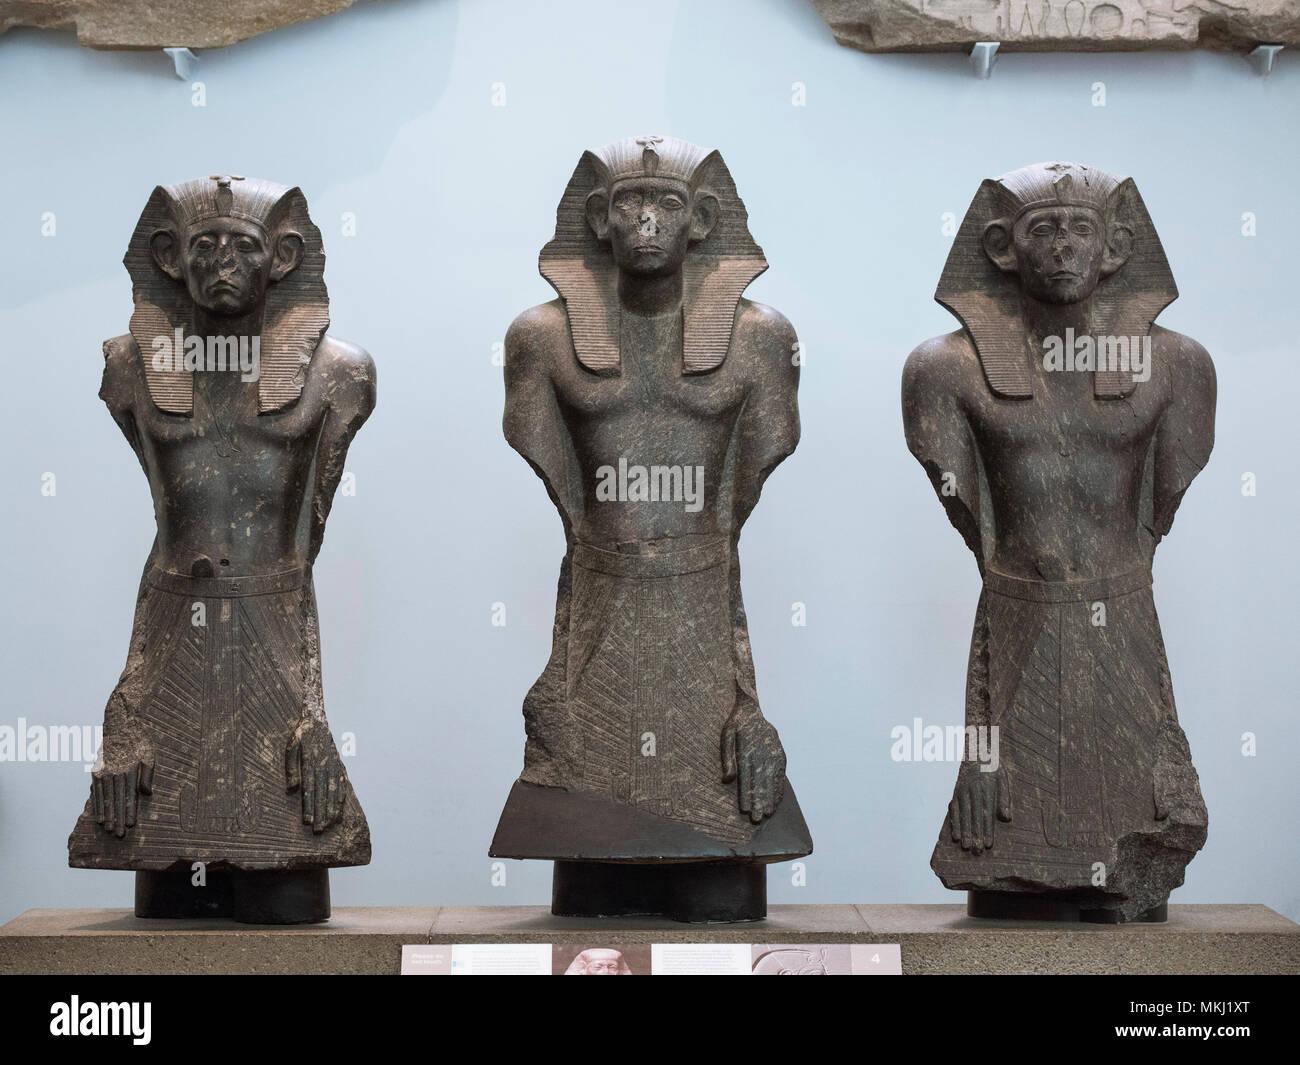 London. England. British Museum. Three statues of Egyptian Pharaoh Senwosret III (or Senusret / Sesostris), wearing a nemes head cloth, ca. 1874-1855  - Stock Image